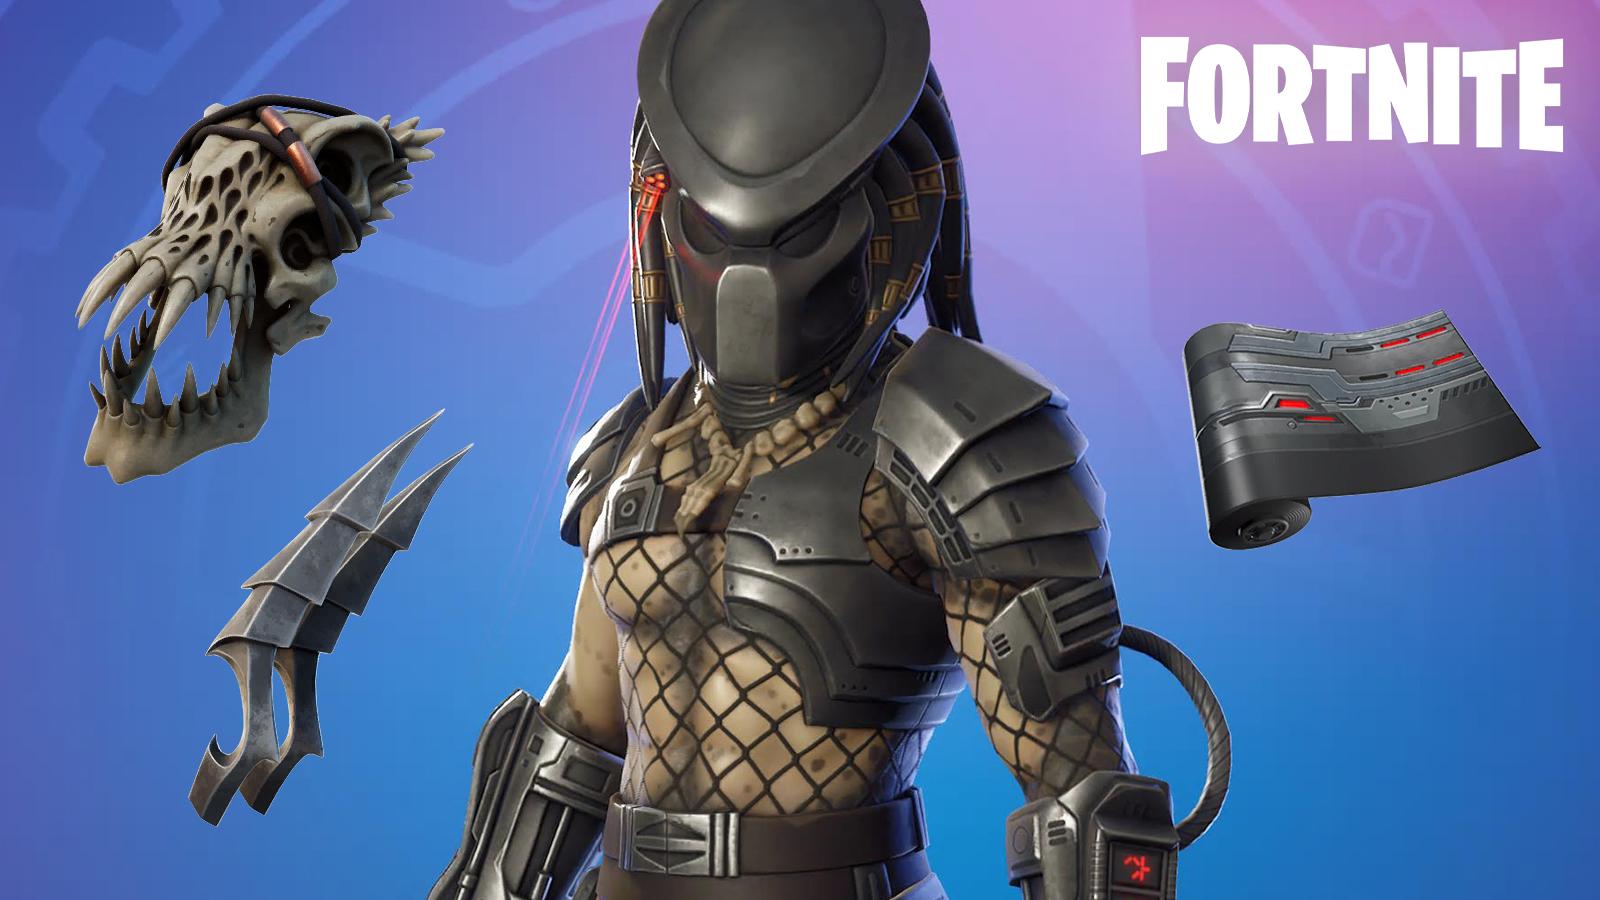 Fortnite Predator Skin and Cosmetics